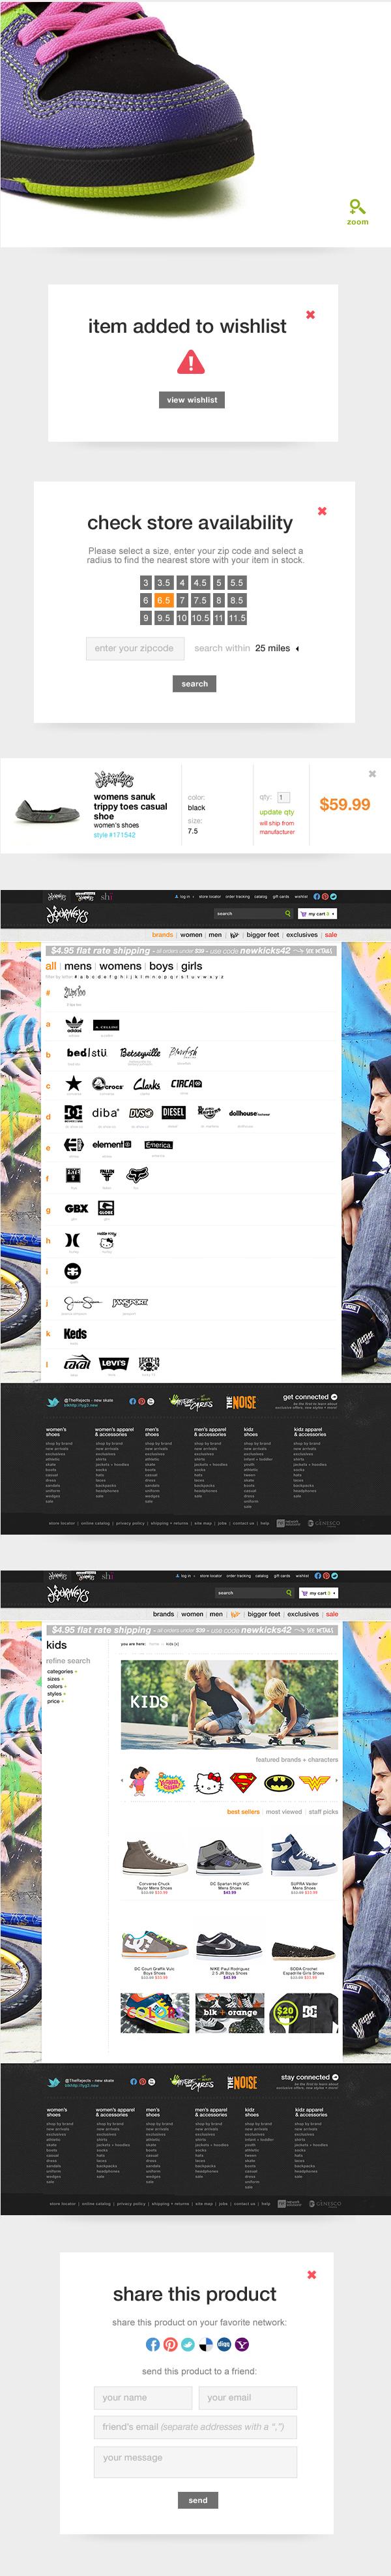 Ecommerce mobile webstore Retail footwear journeys store re-design